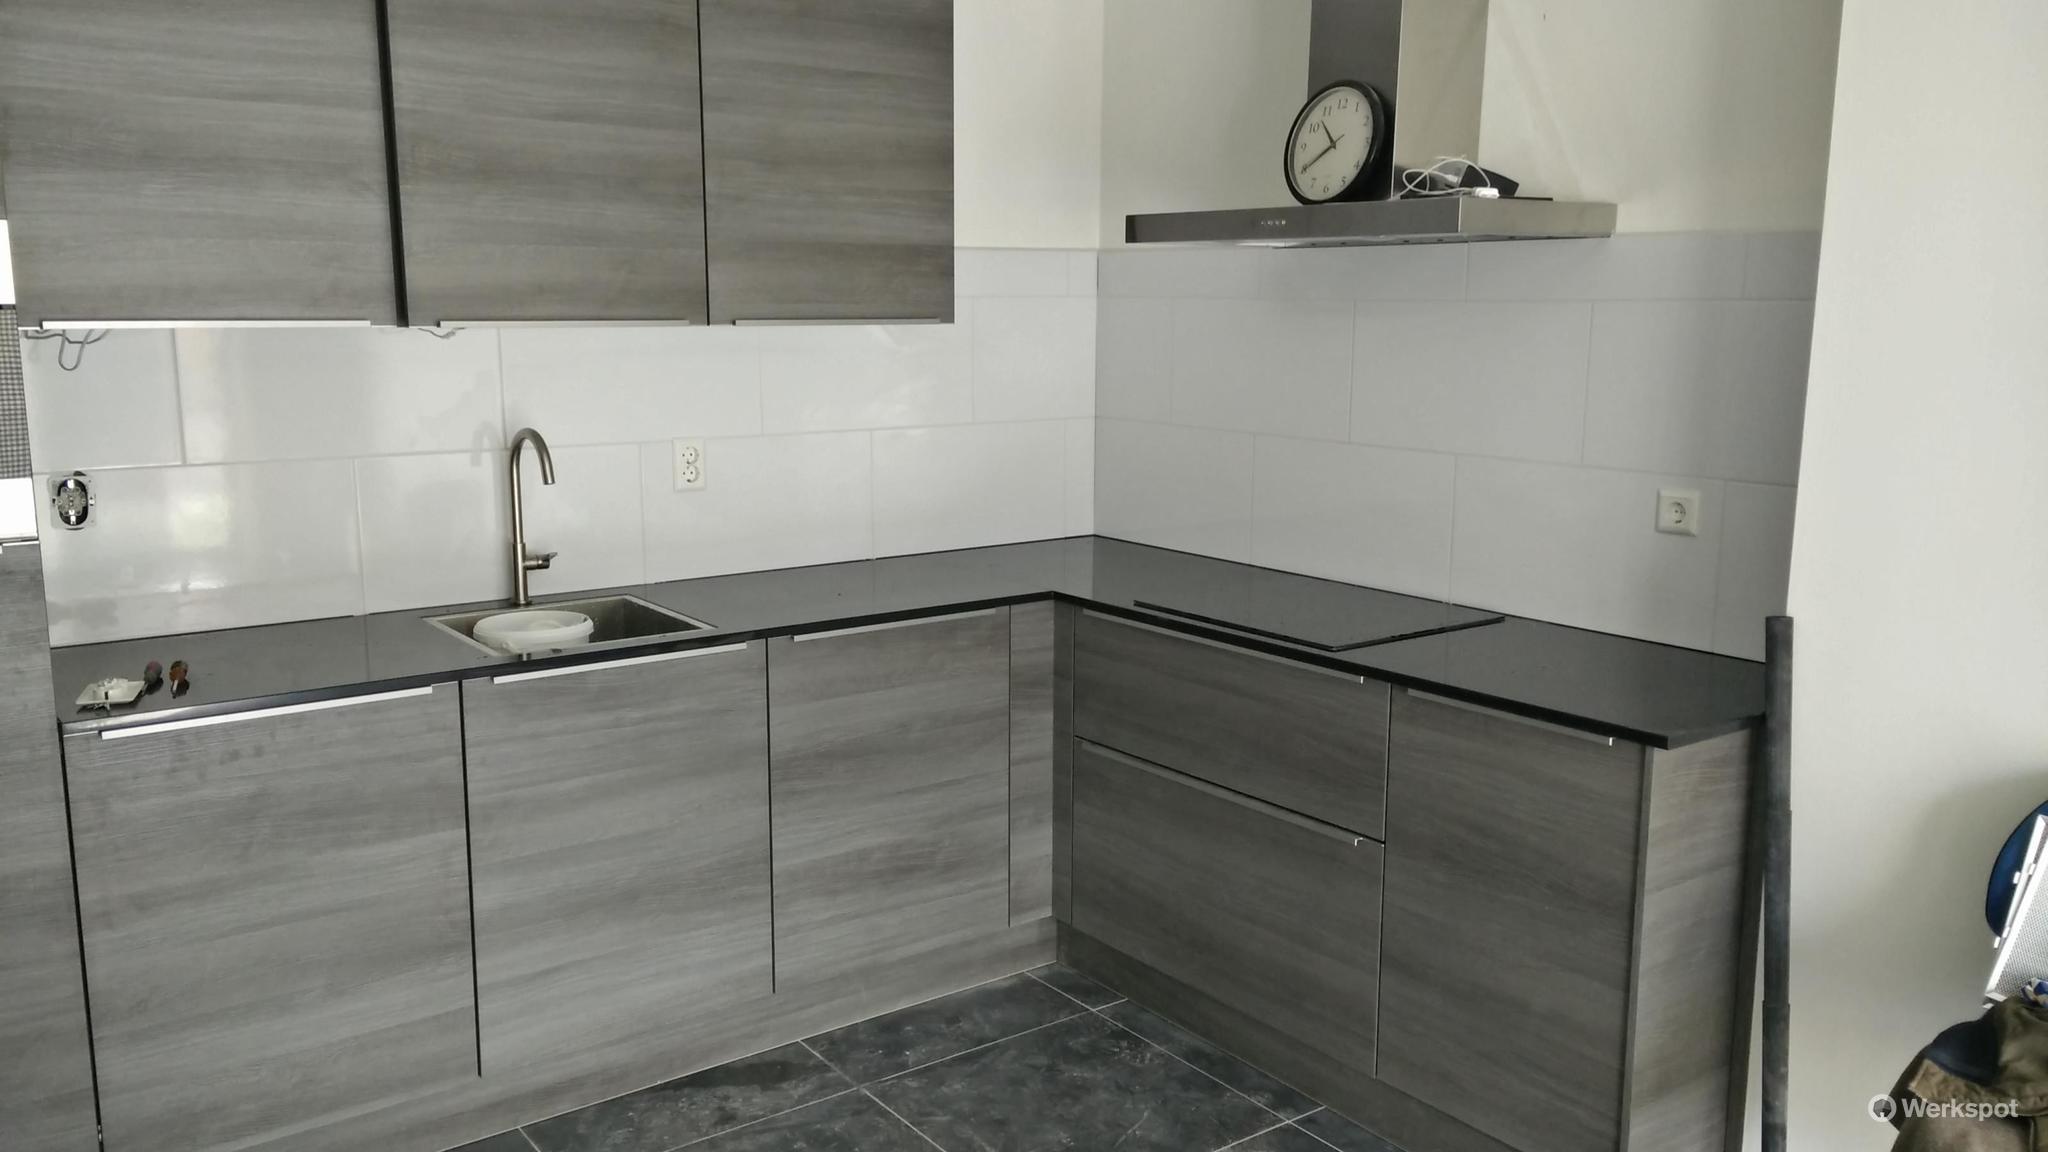 Diy Keuken Kleine : Keuken eethoek klein